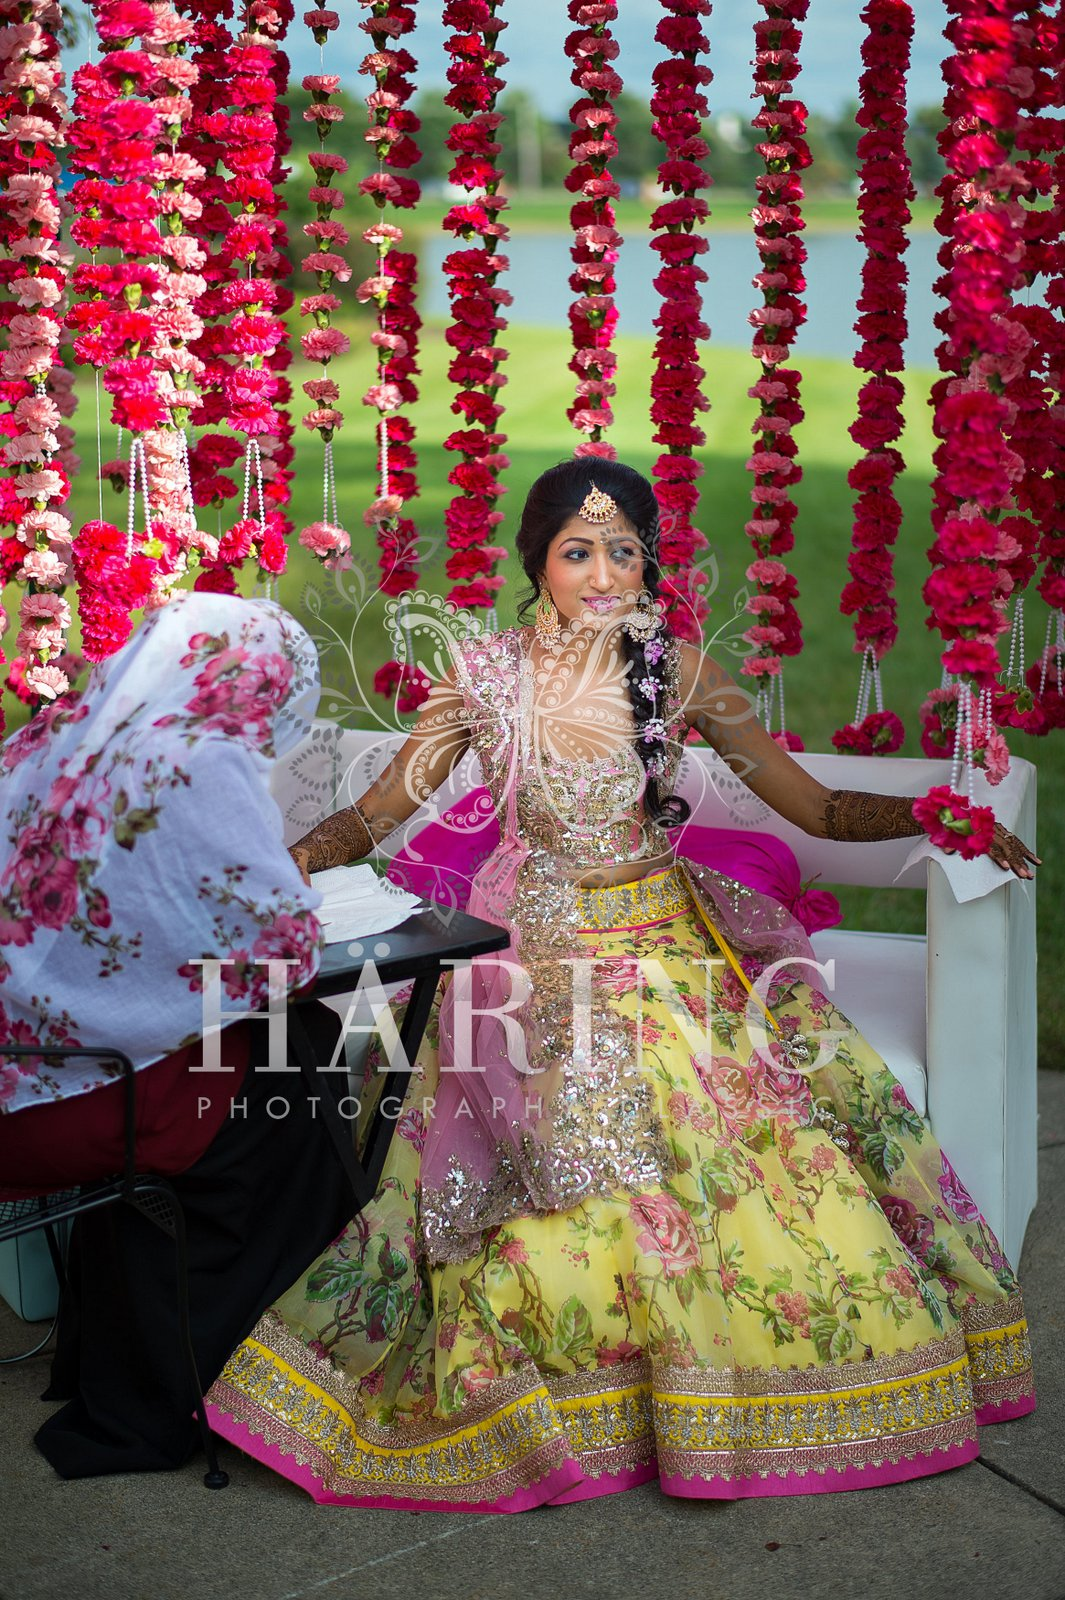 Simple Mehndi Wedding Decoration | Neha, Miami Wedding Photographers | Häring Photography, Indian Wedding Photographer in Florida, Best Muslim, Hindu - South East Asian Wedding Photographers